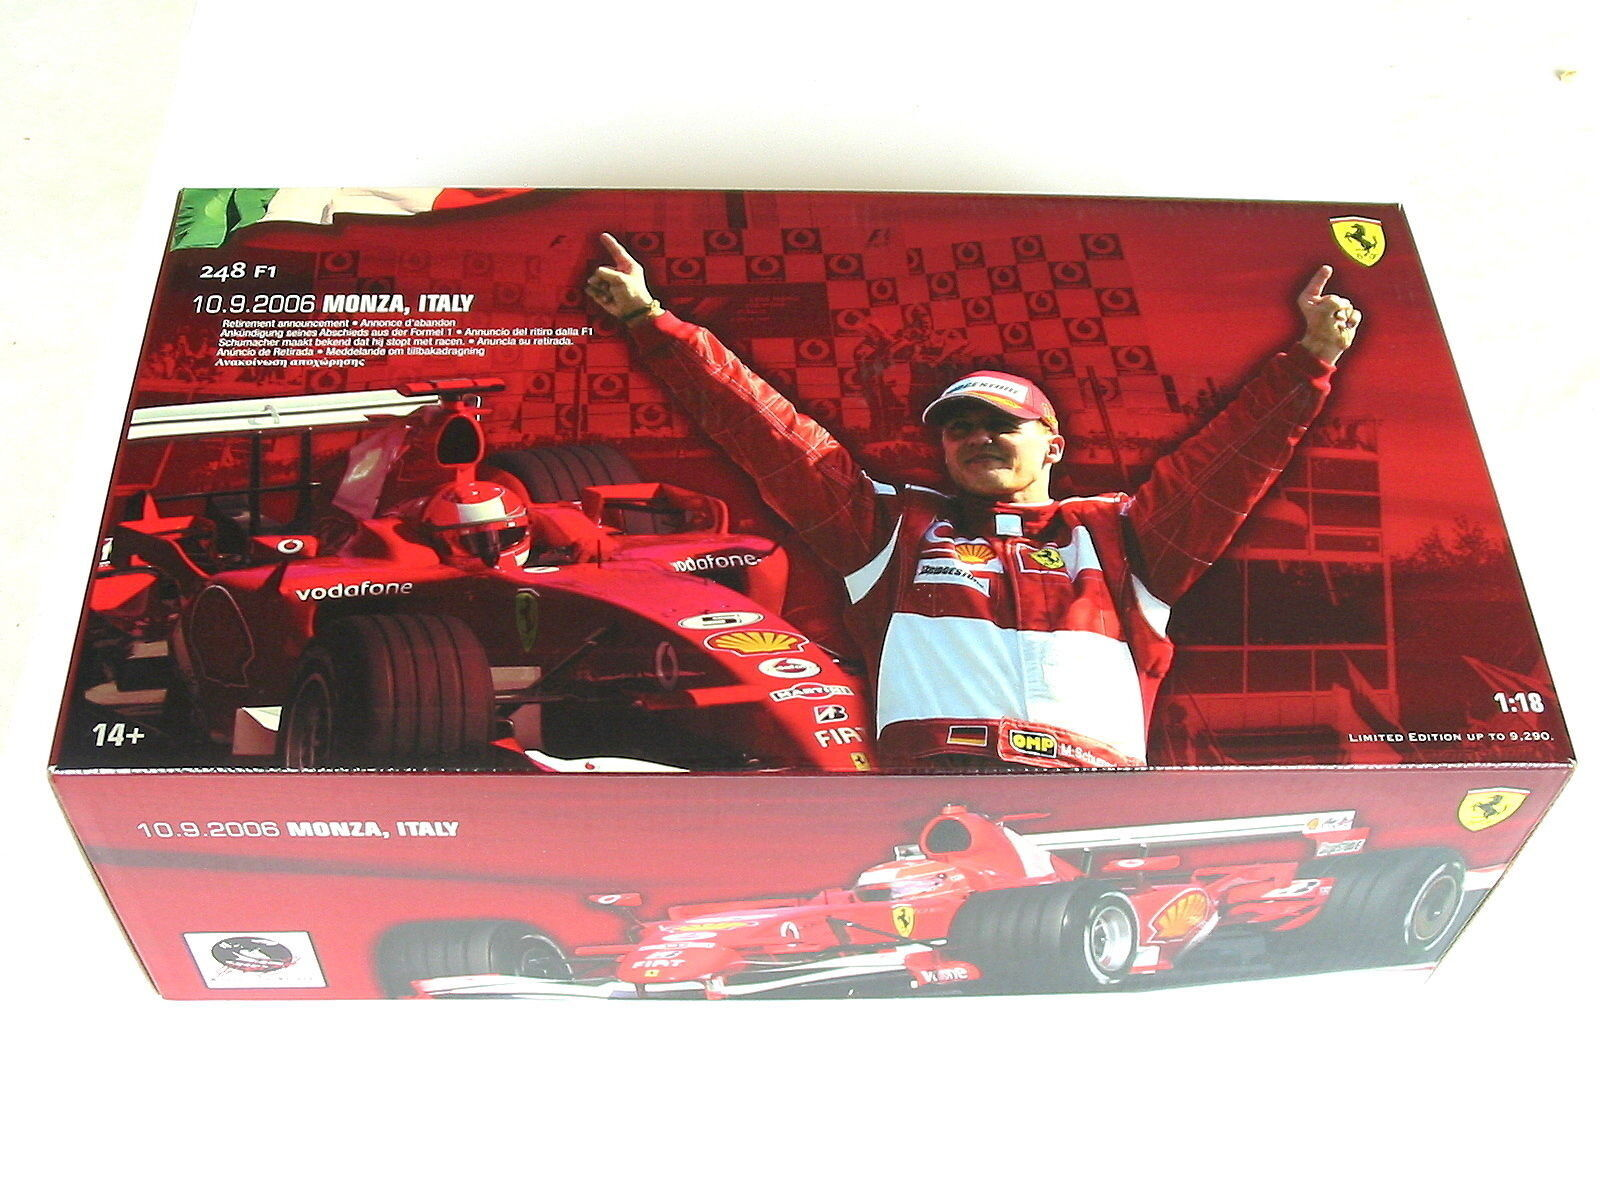 FERRARI 248 248 248 f1 Schumacher personaggio GP ITALY Winner Monza 2006 MSC HW j2994 1/18 OVP f48b14